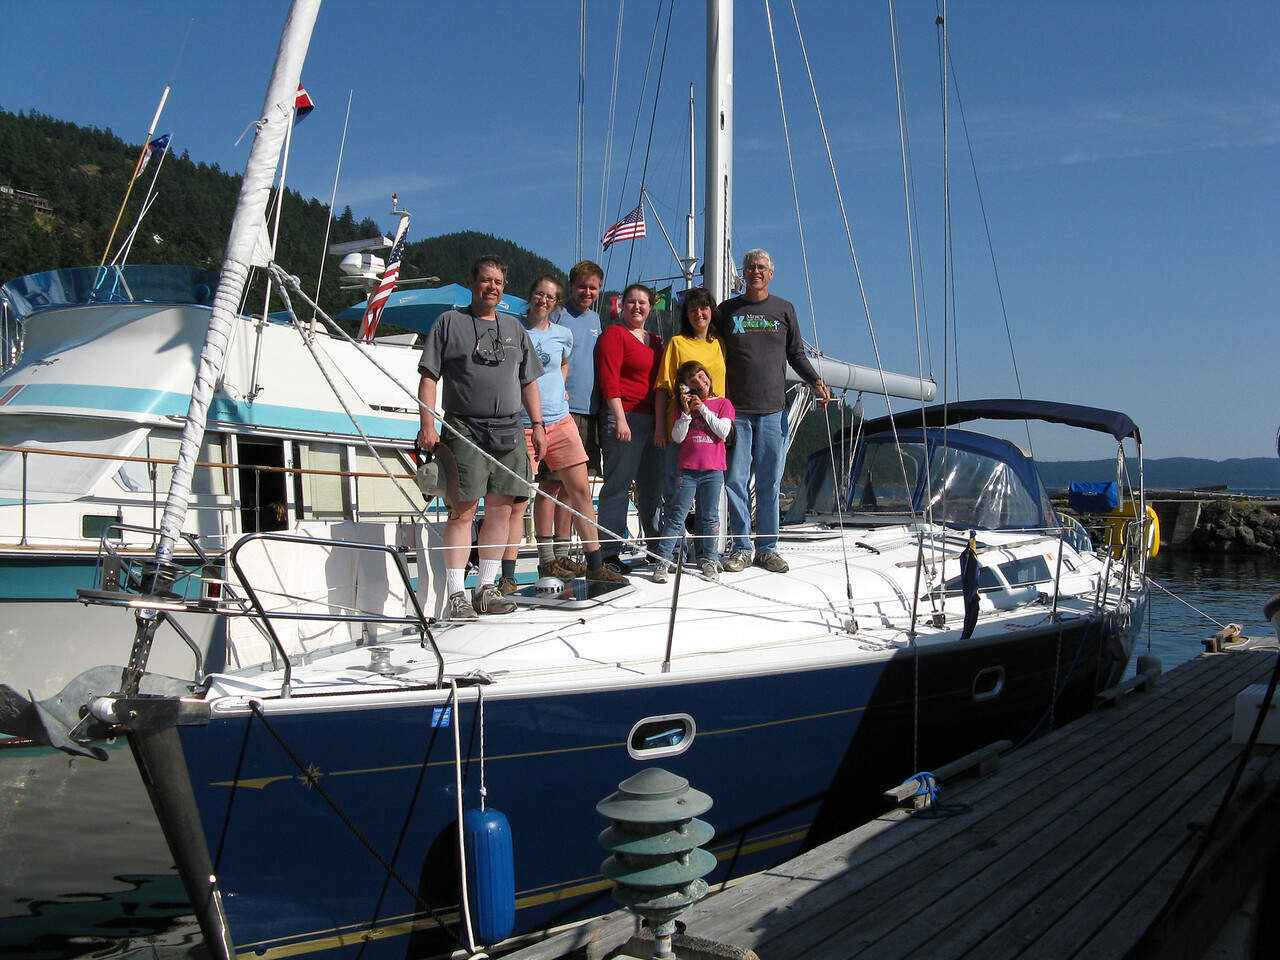 09 07 26-08 02 Sail SJ 424